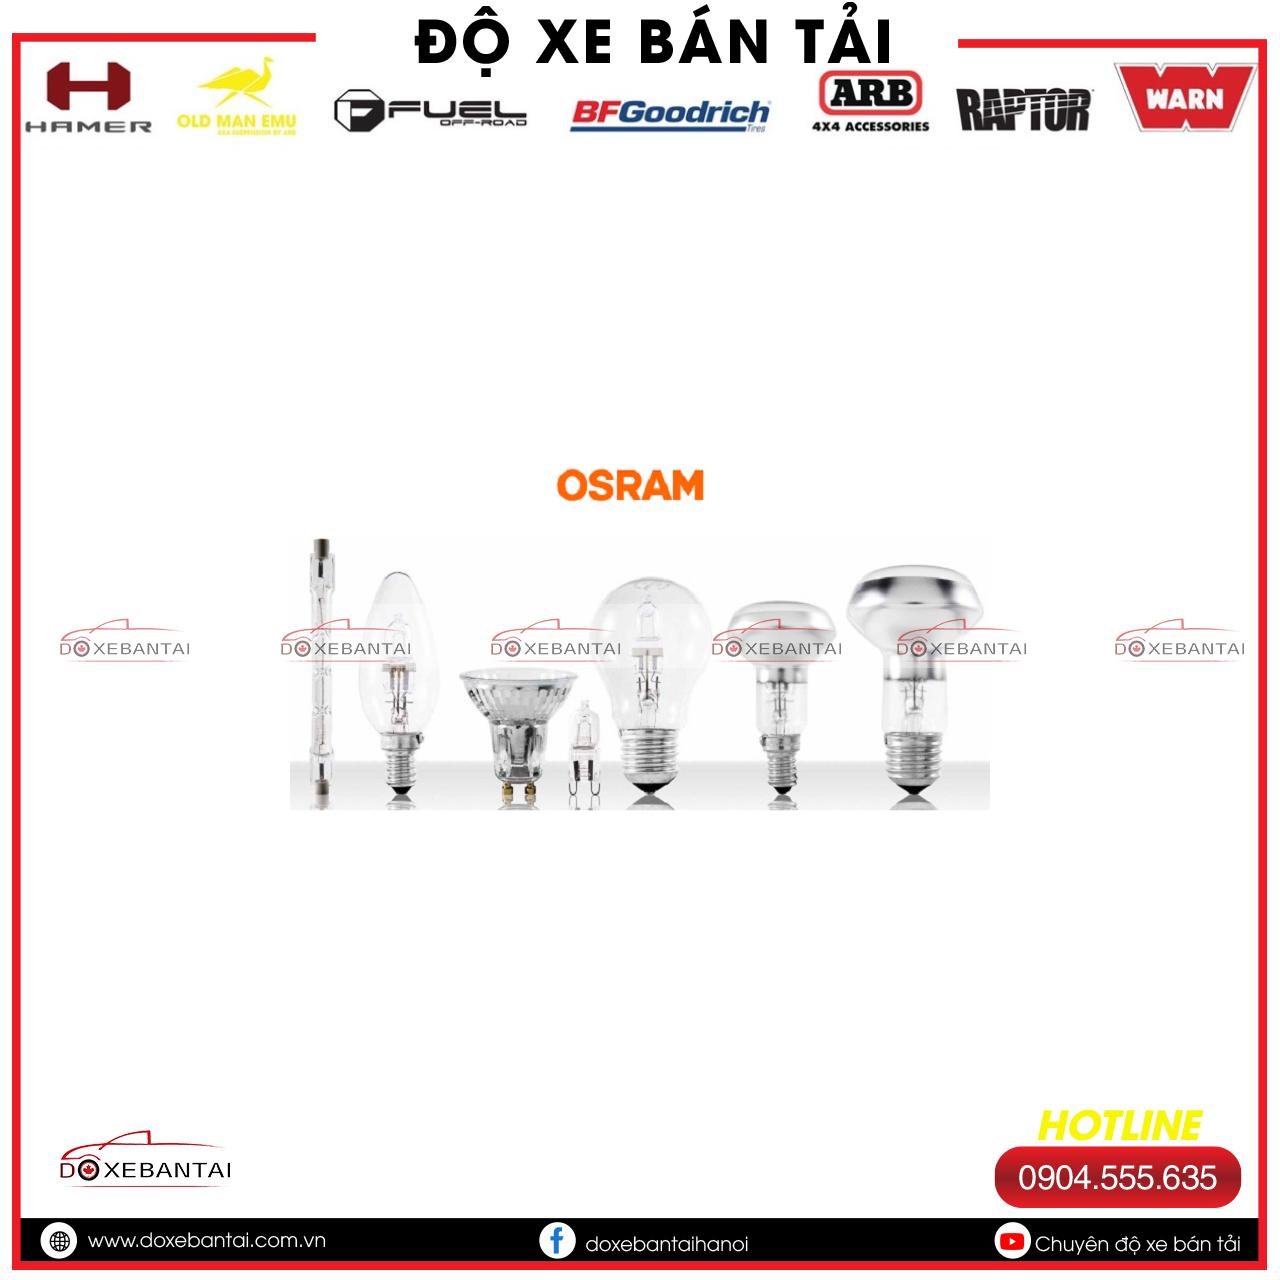 Den-Xenon-Osram-va-nhung-thong-tin-ban-can-biet-1.jpg